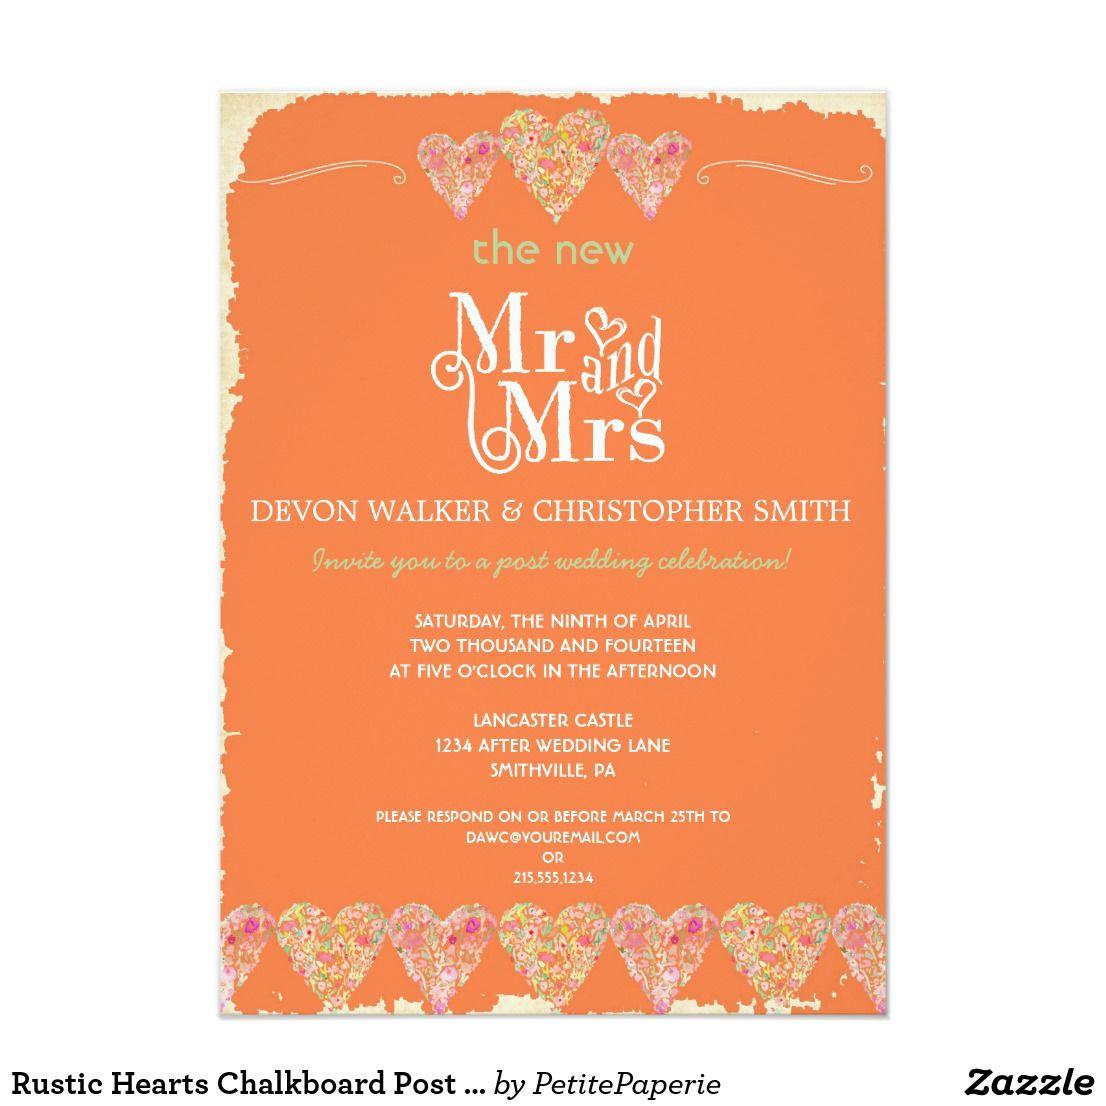 Rustic Hearts Chalkboard Post Wedding Invitation | Chalkboard ...